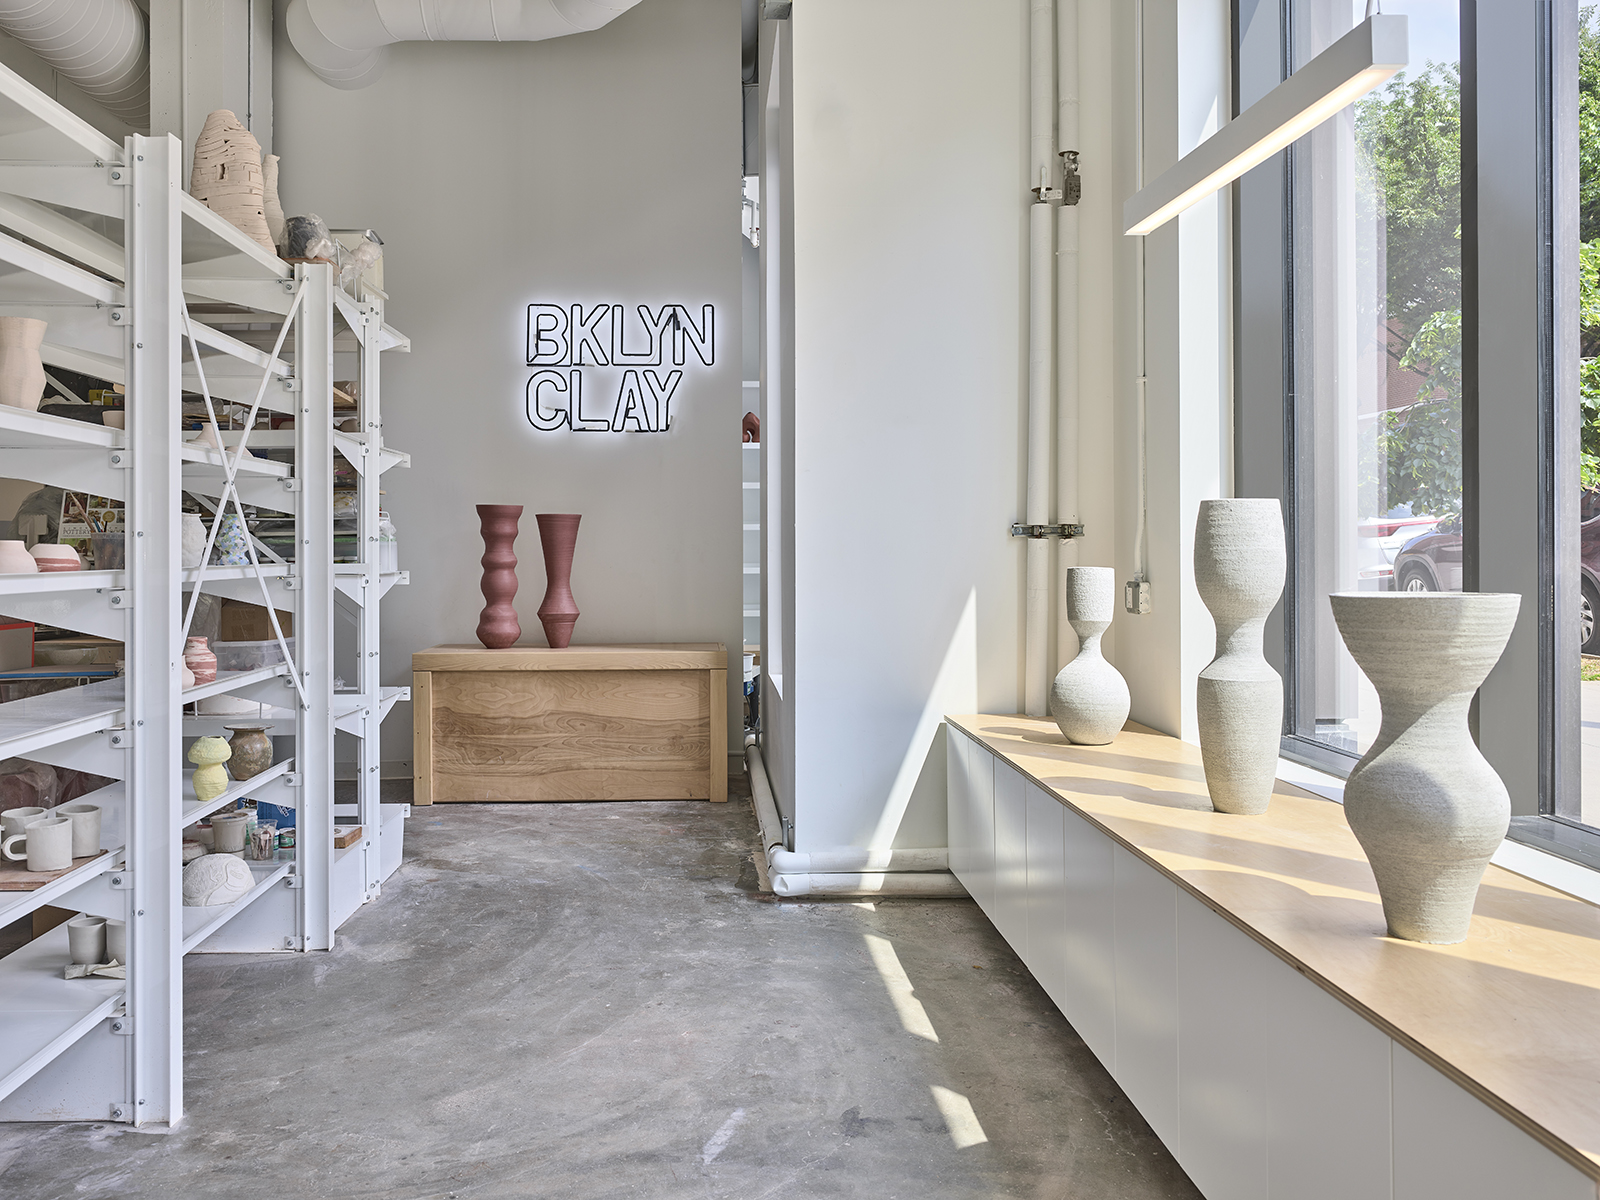 Photo FRANK OUDEMAN / Ceramic Vessels KYLE LEE